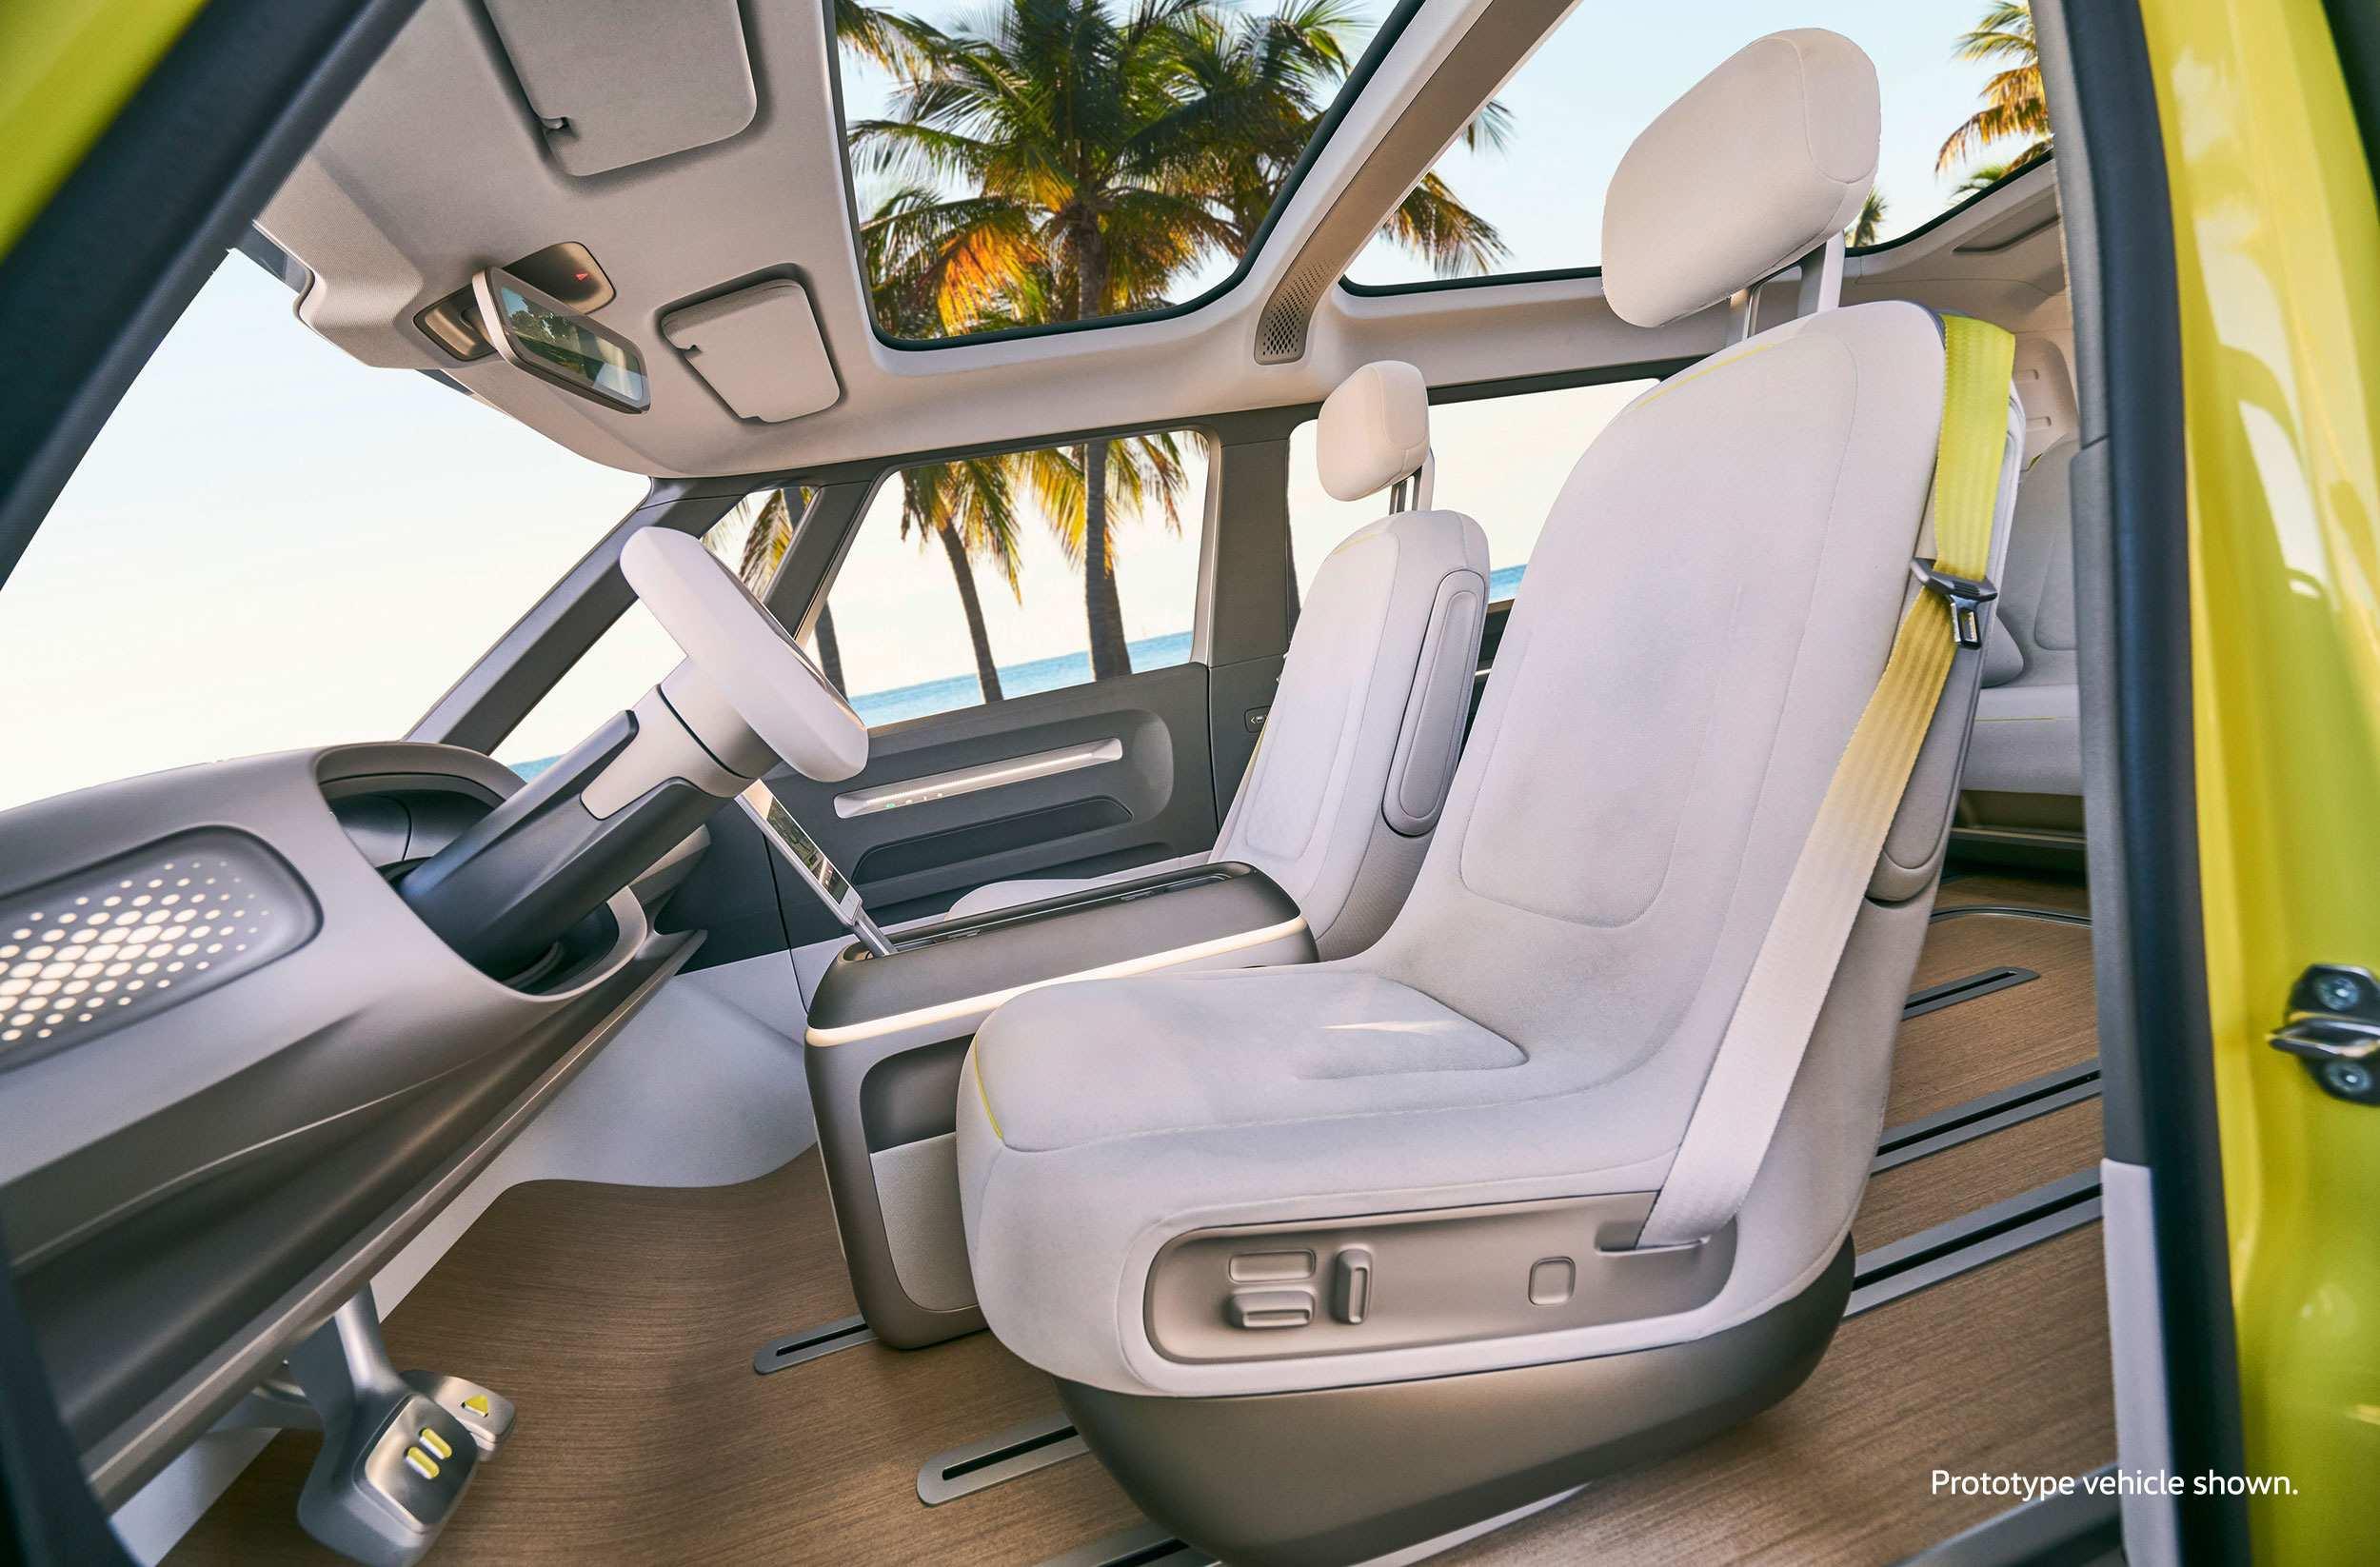 80 All New 2020 VW Bulli 2018 New Concept with 2020 VW Bulli 2018